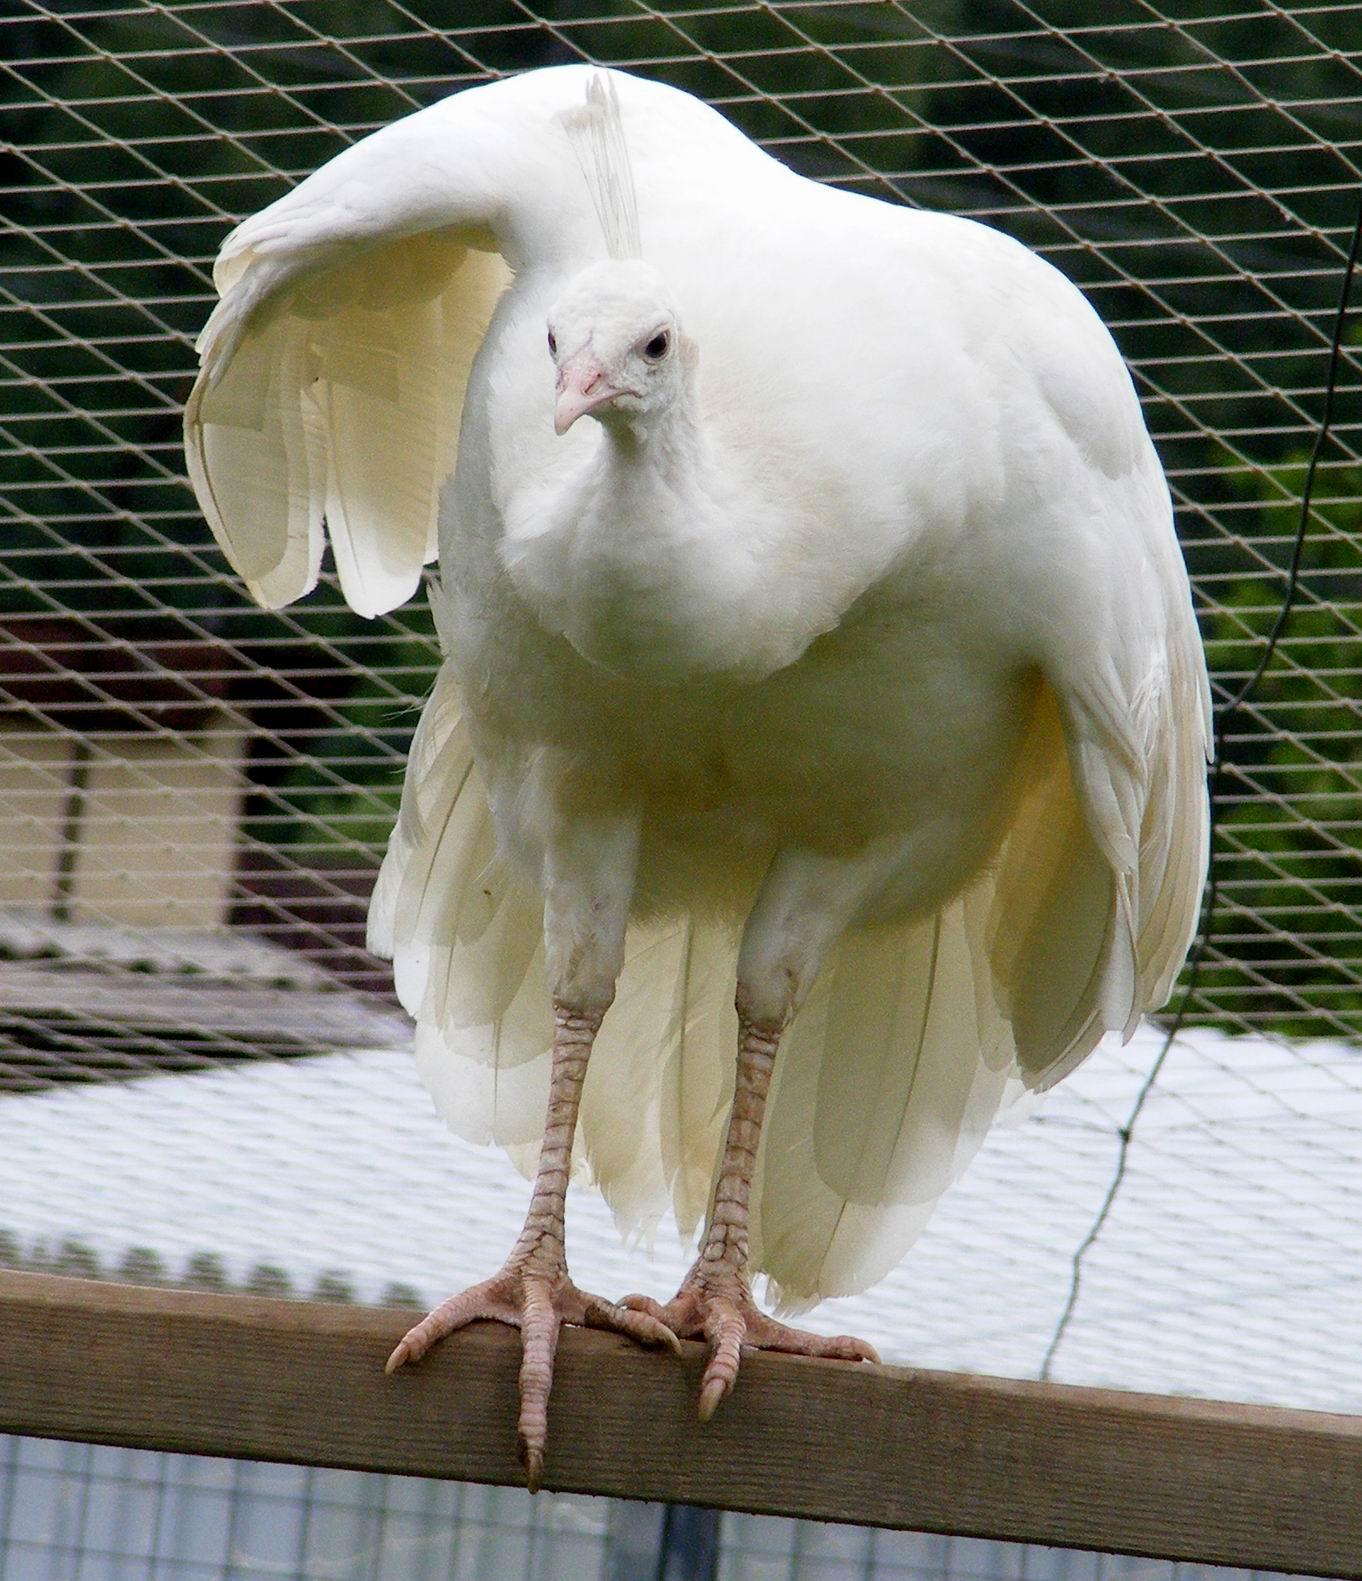 Индийский белый павлин. Парк птиц 'Воробьи'